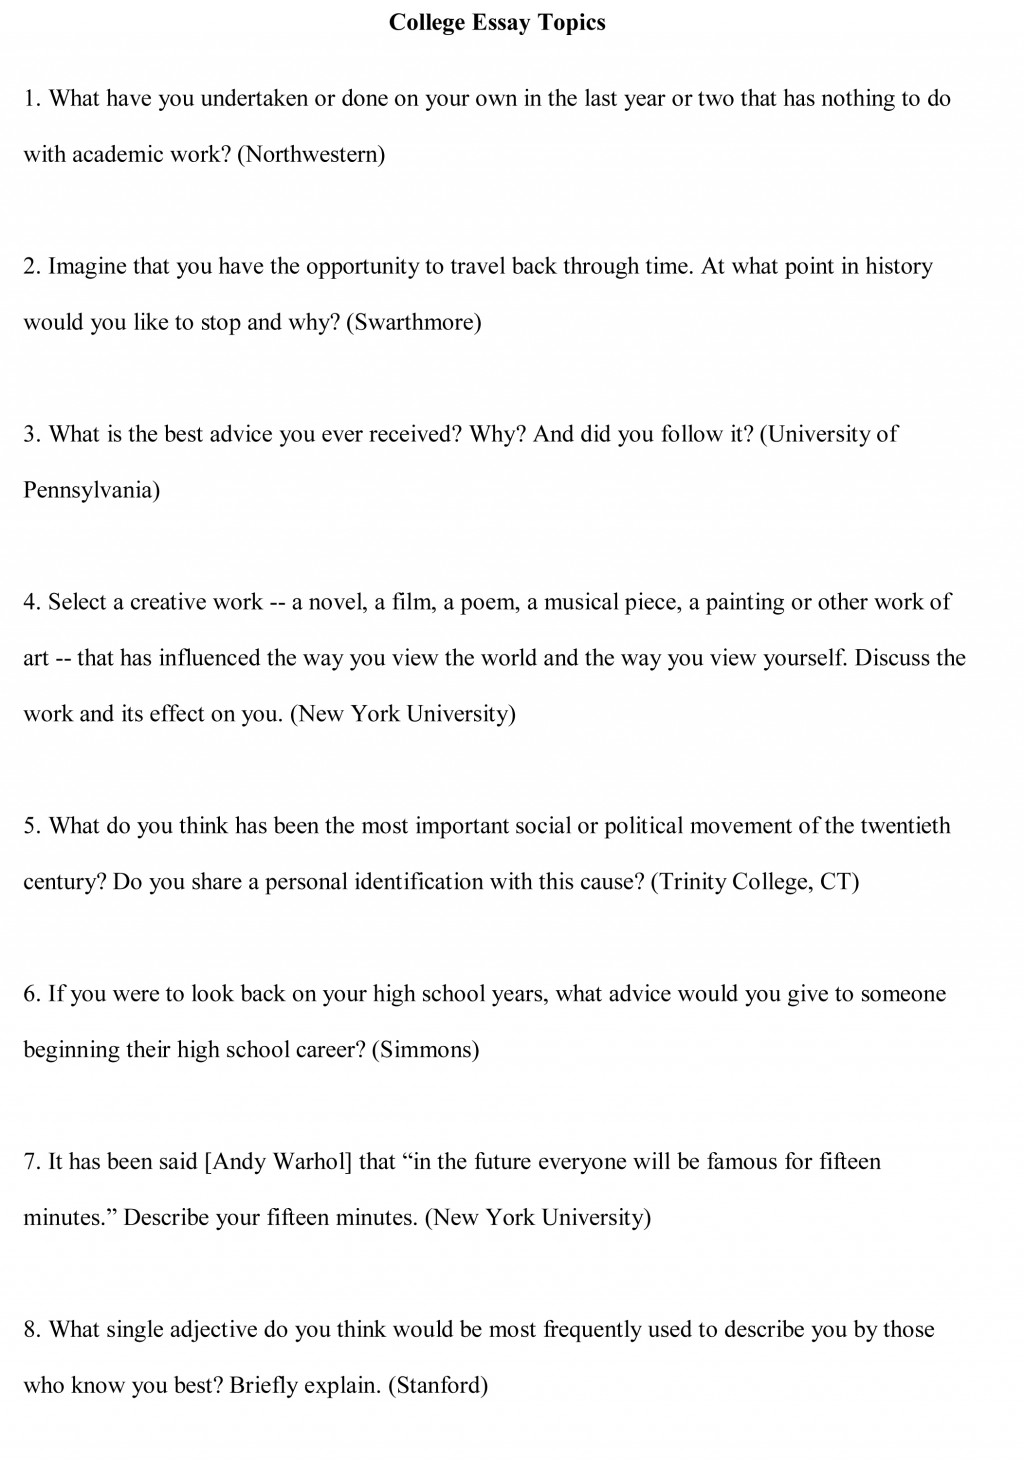 example of a college persuasive essay